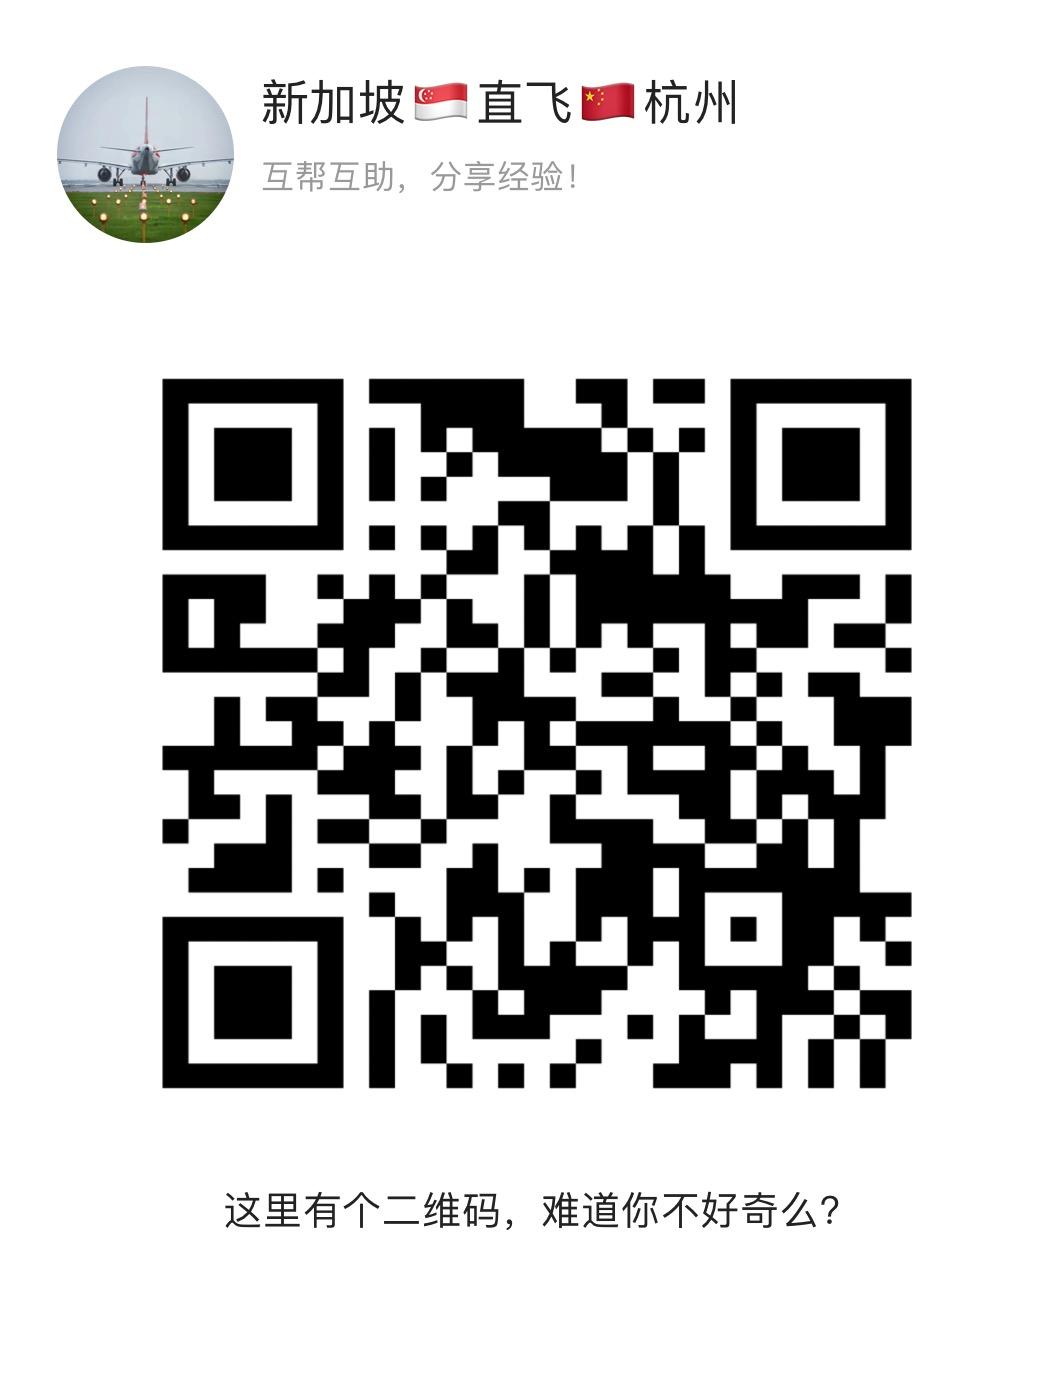 8E93CB07-BDD6-4151-BBD9-9E277311B411.jpeg